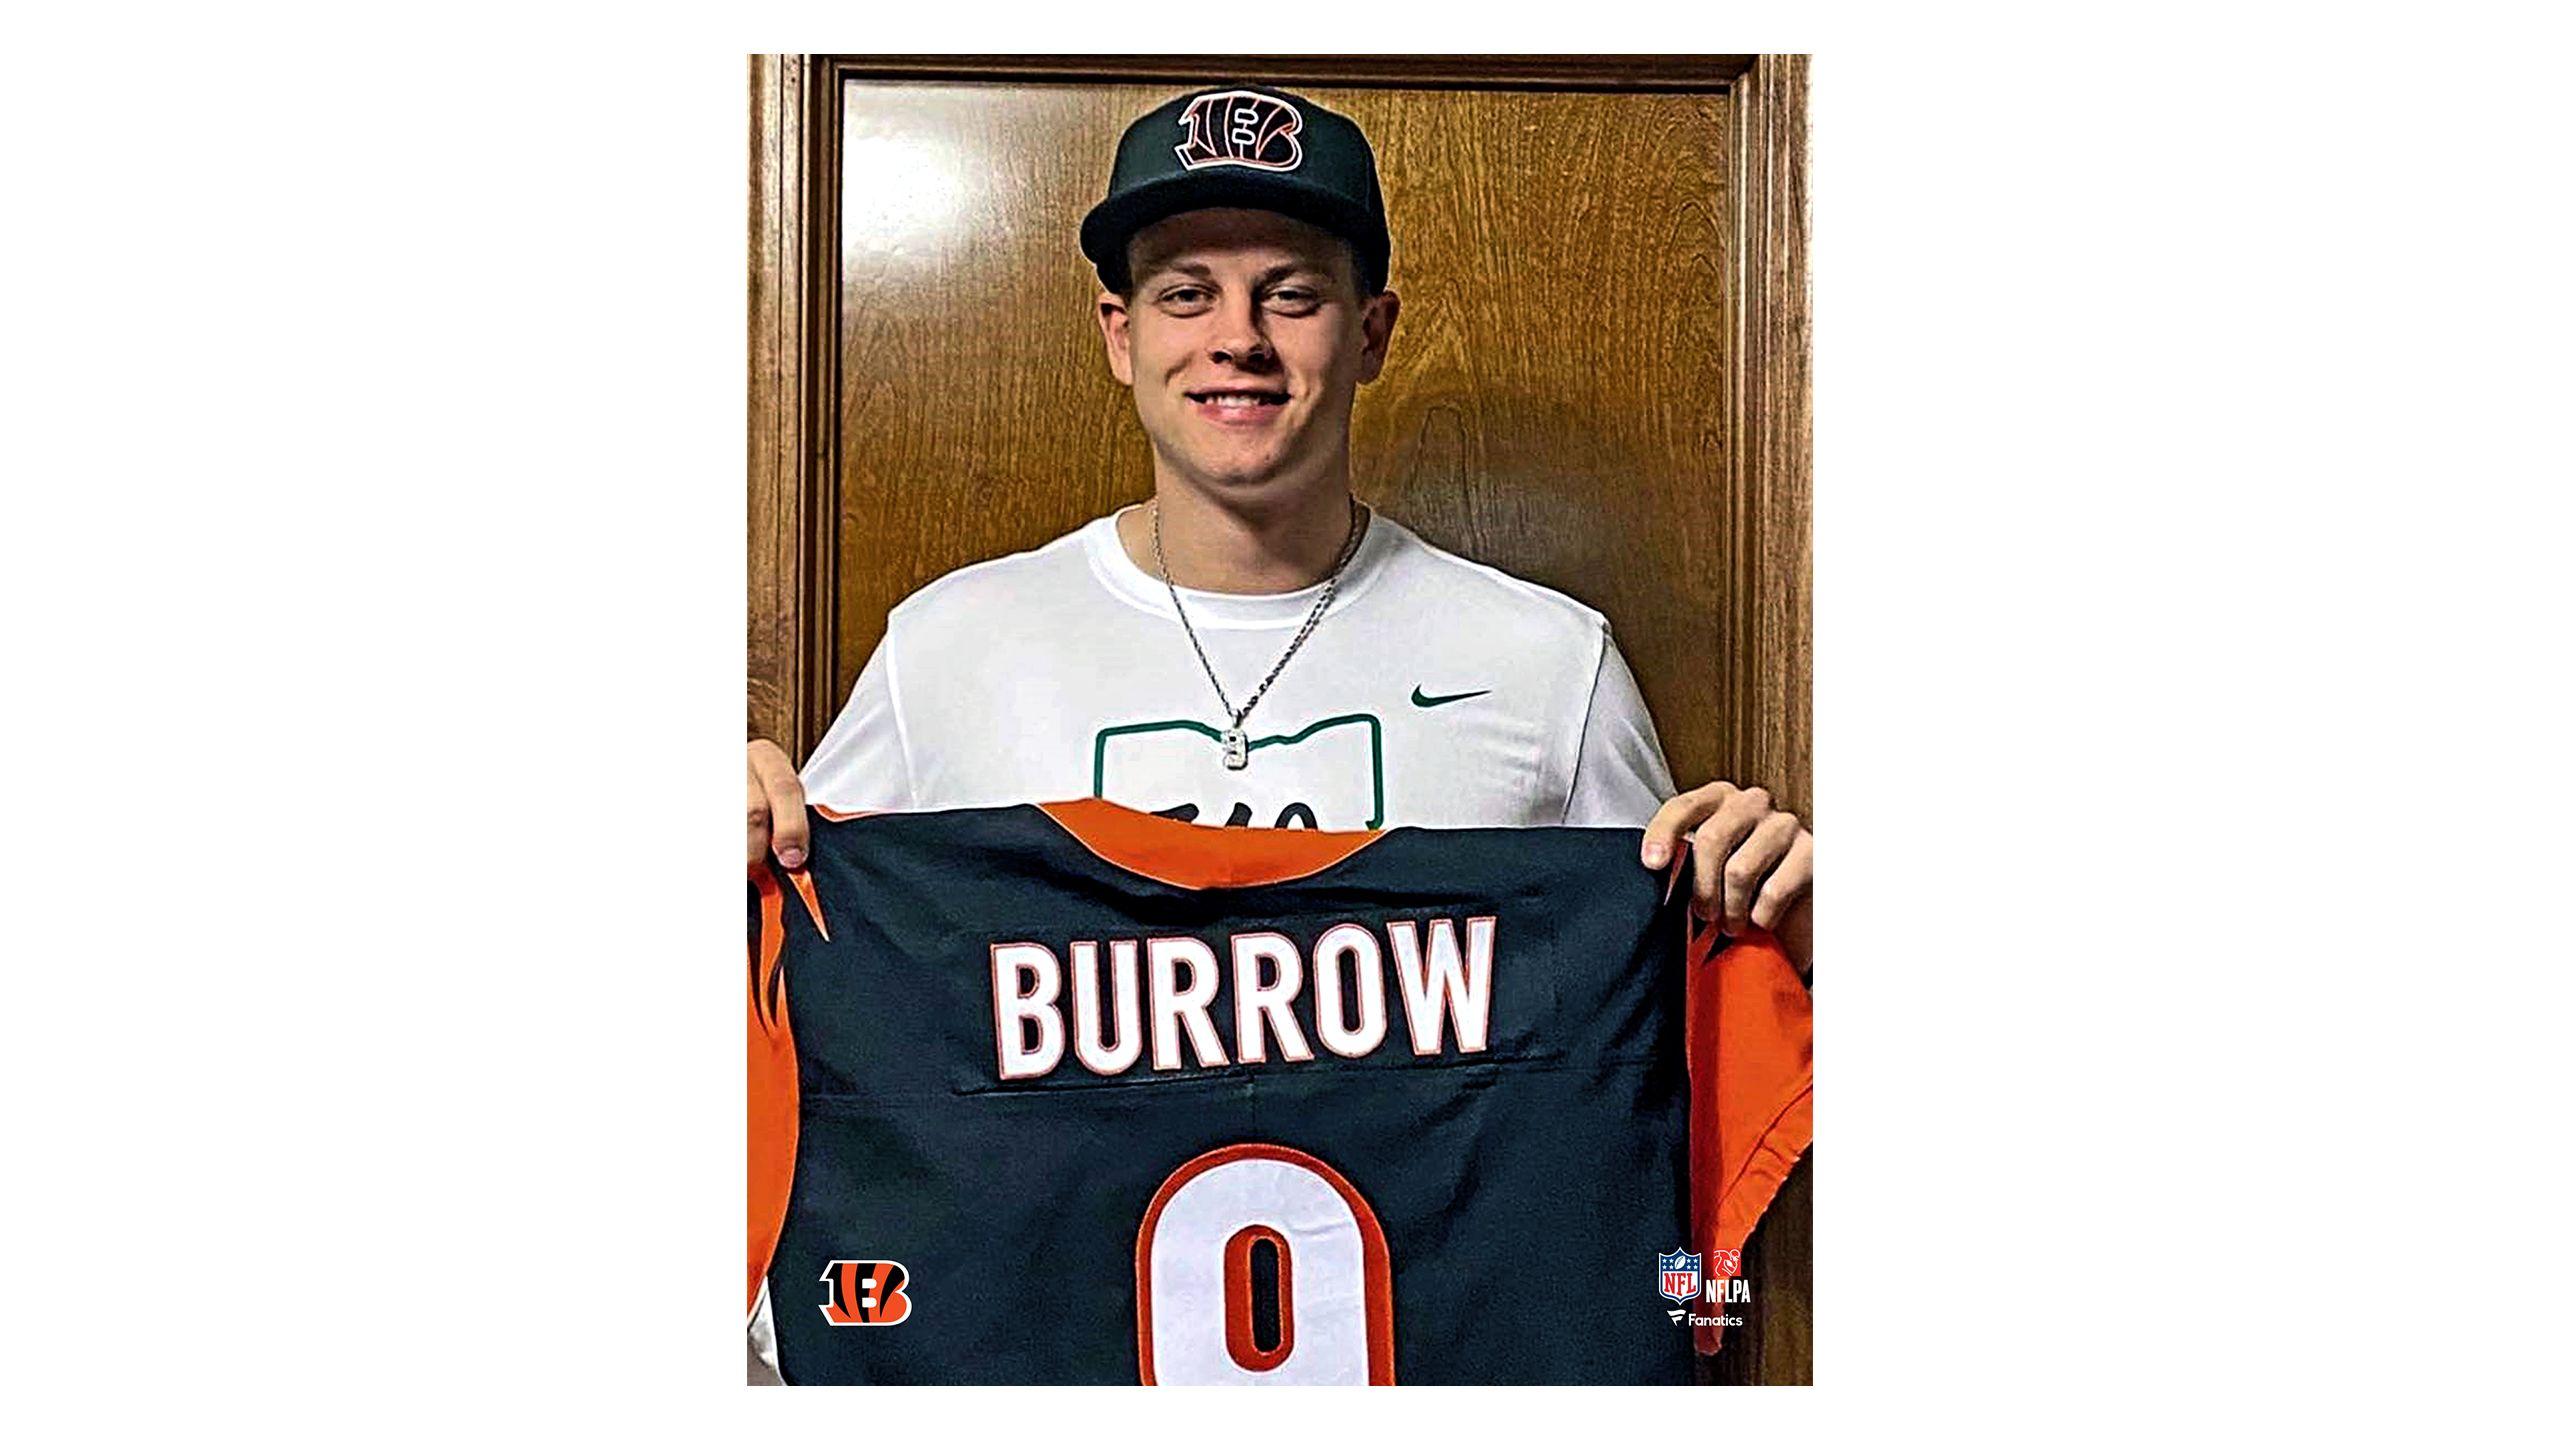 Burrow Draft Photo